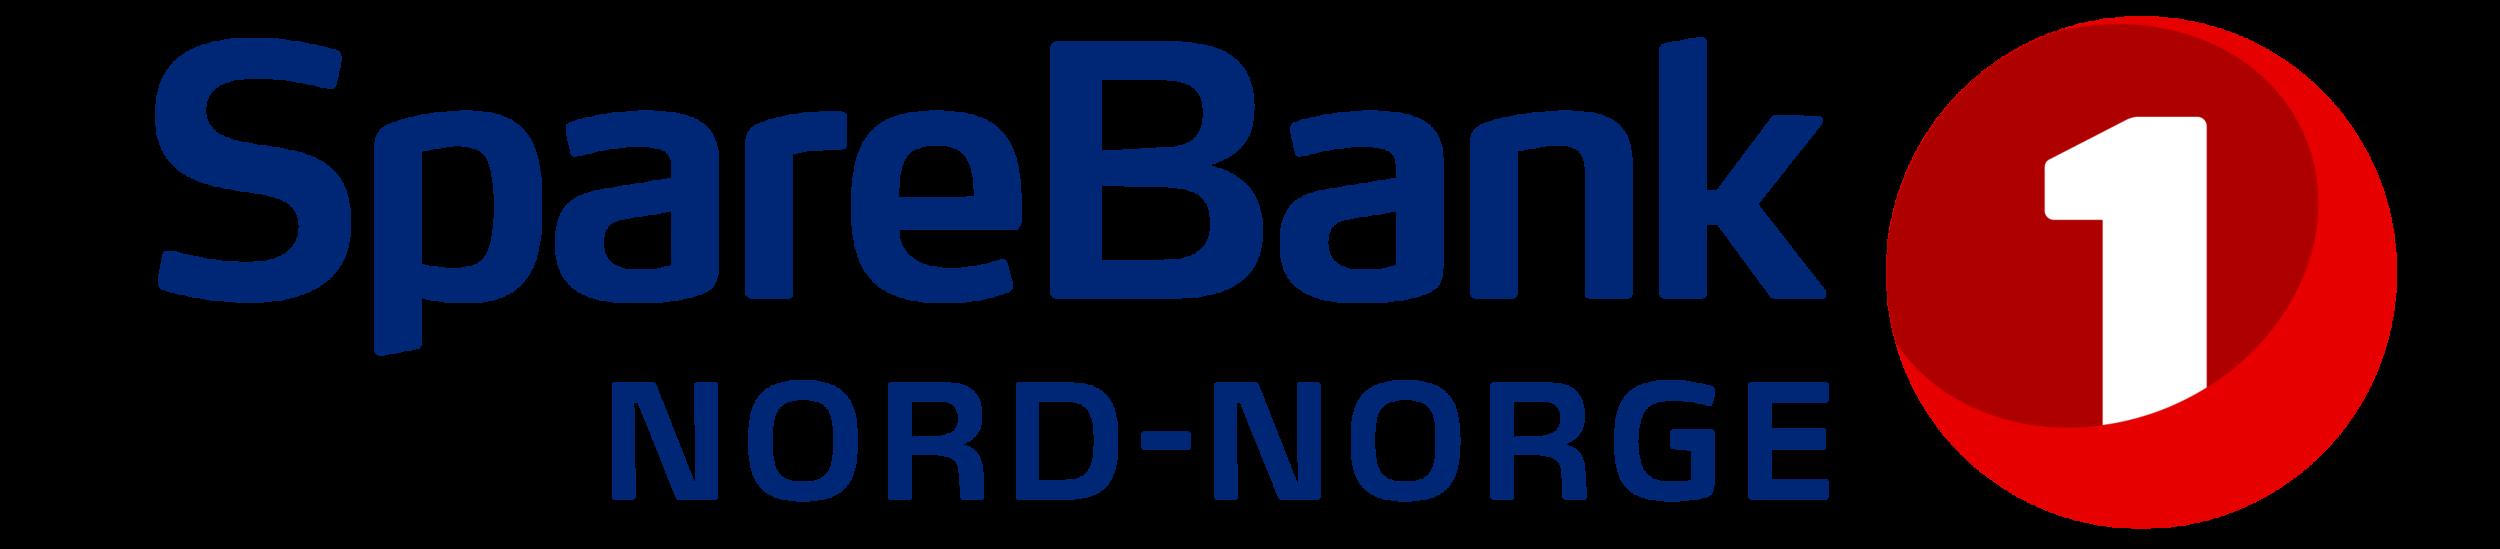 rgb_SB1_Nord_Norge_verti_pos_2.png